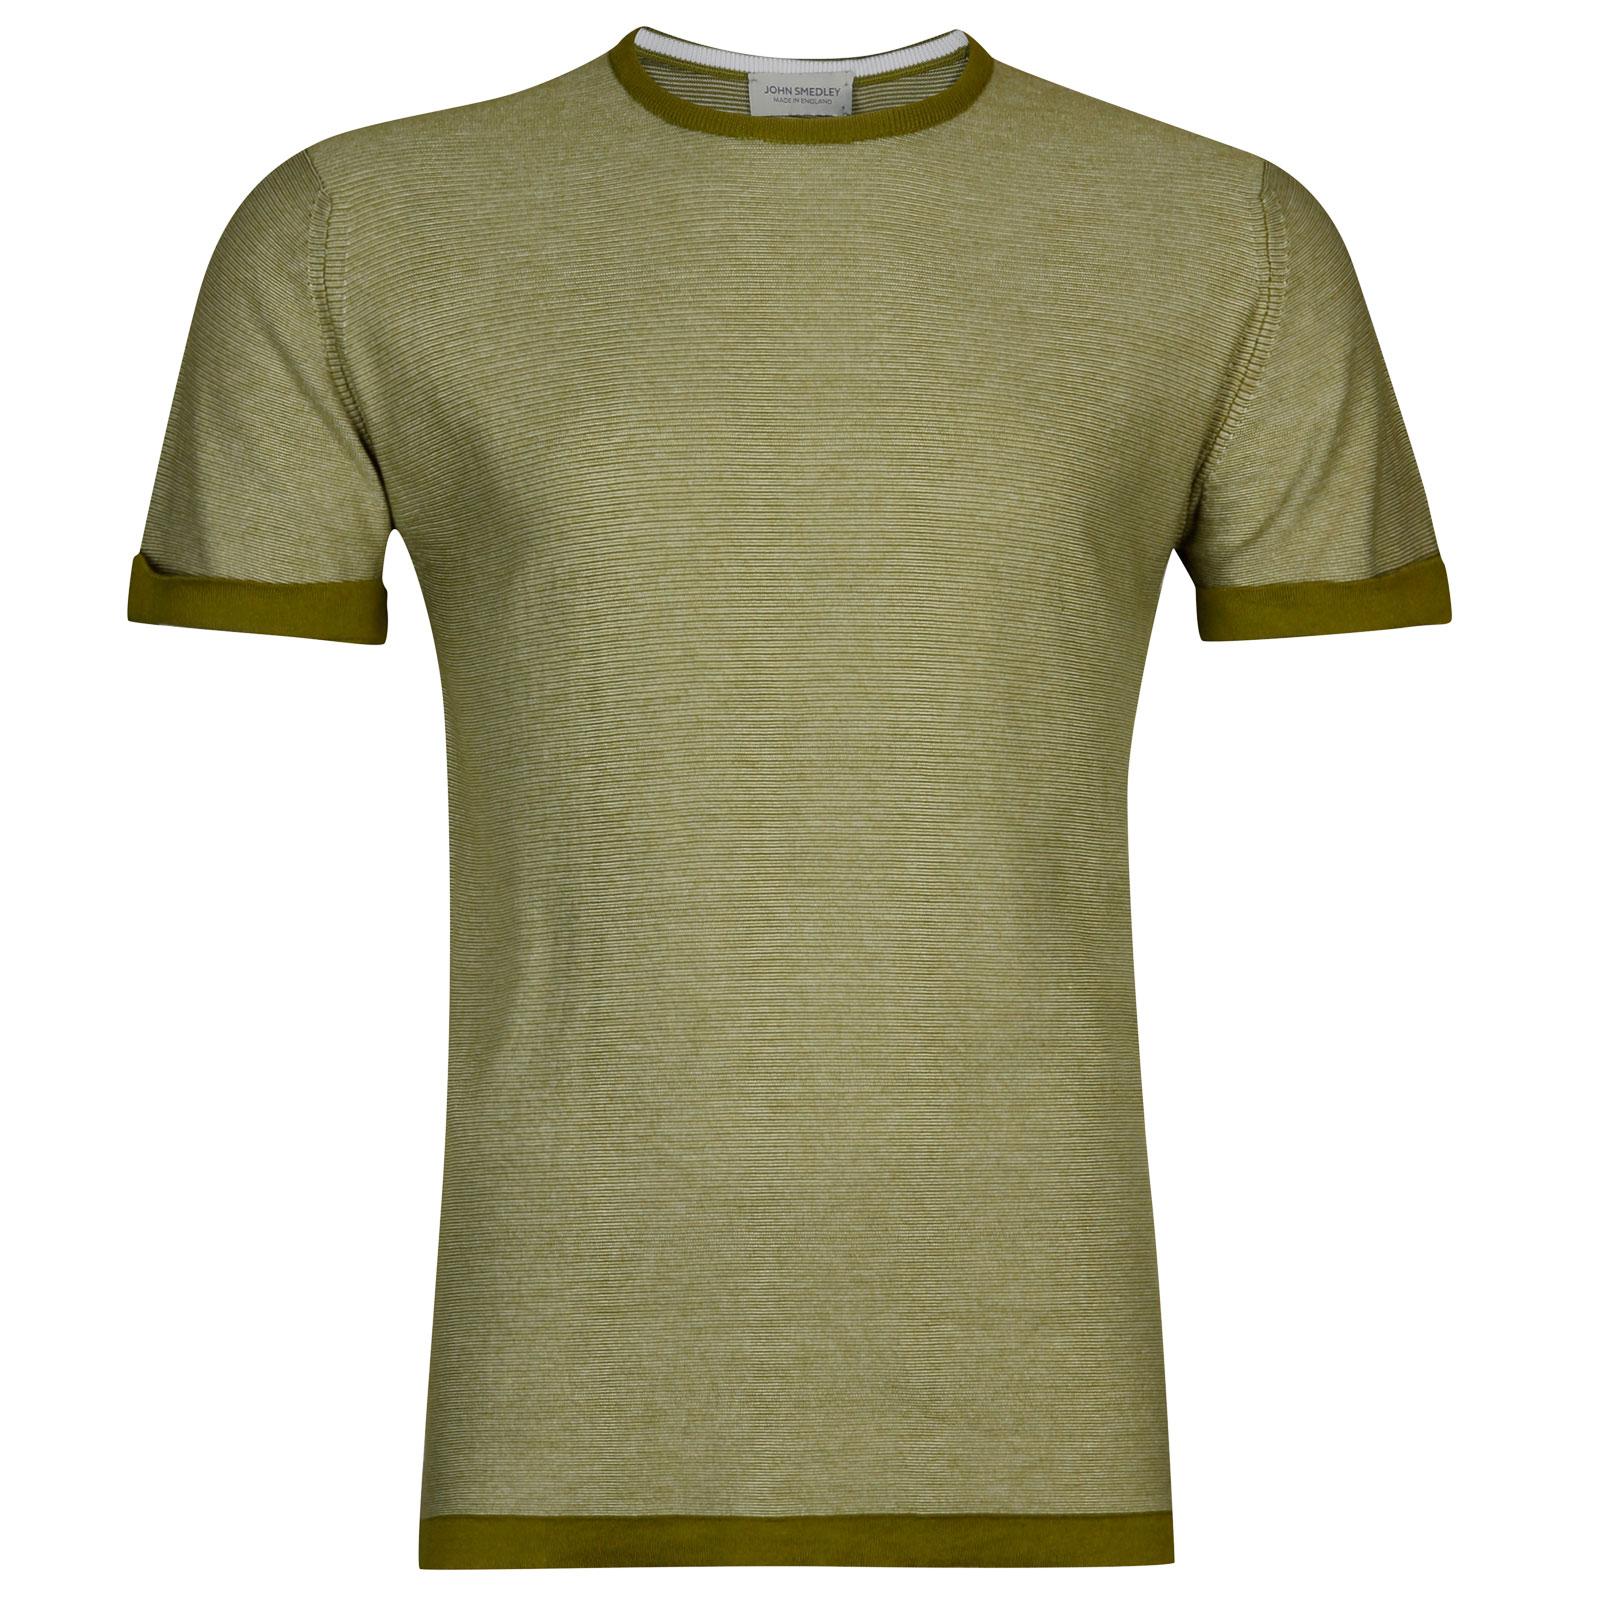 John Smedley benhope Sea Island Cotton T-shirt in Lumsdale